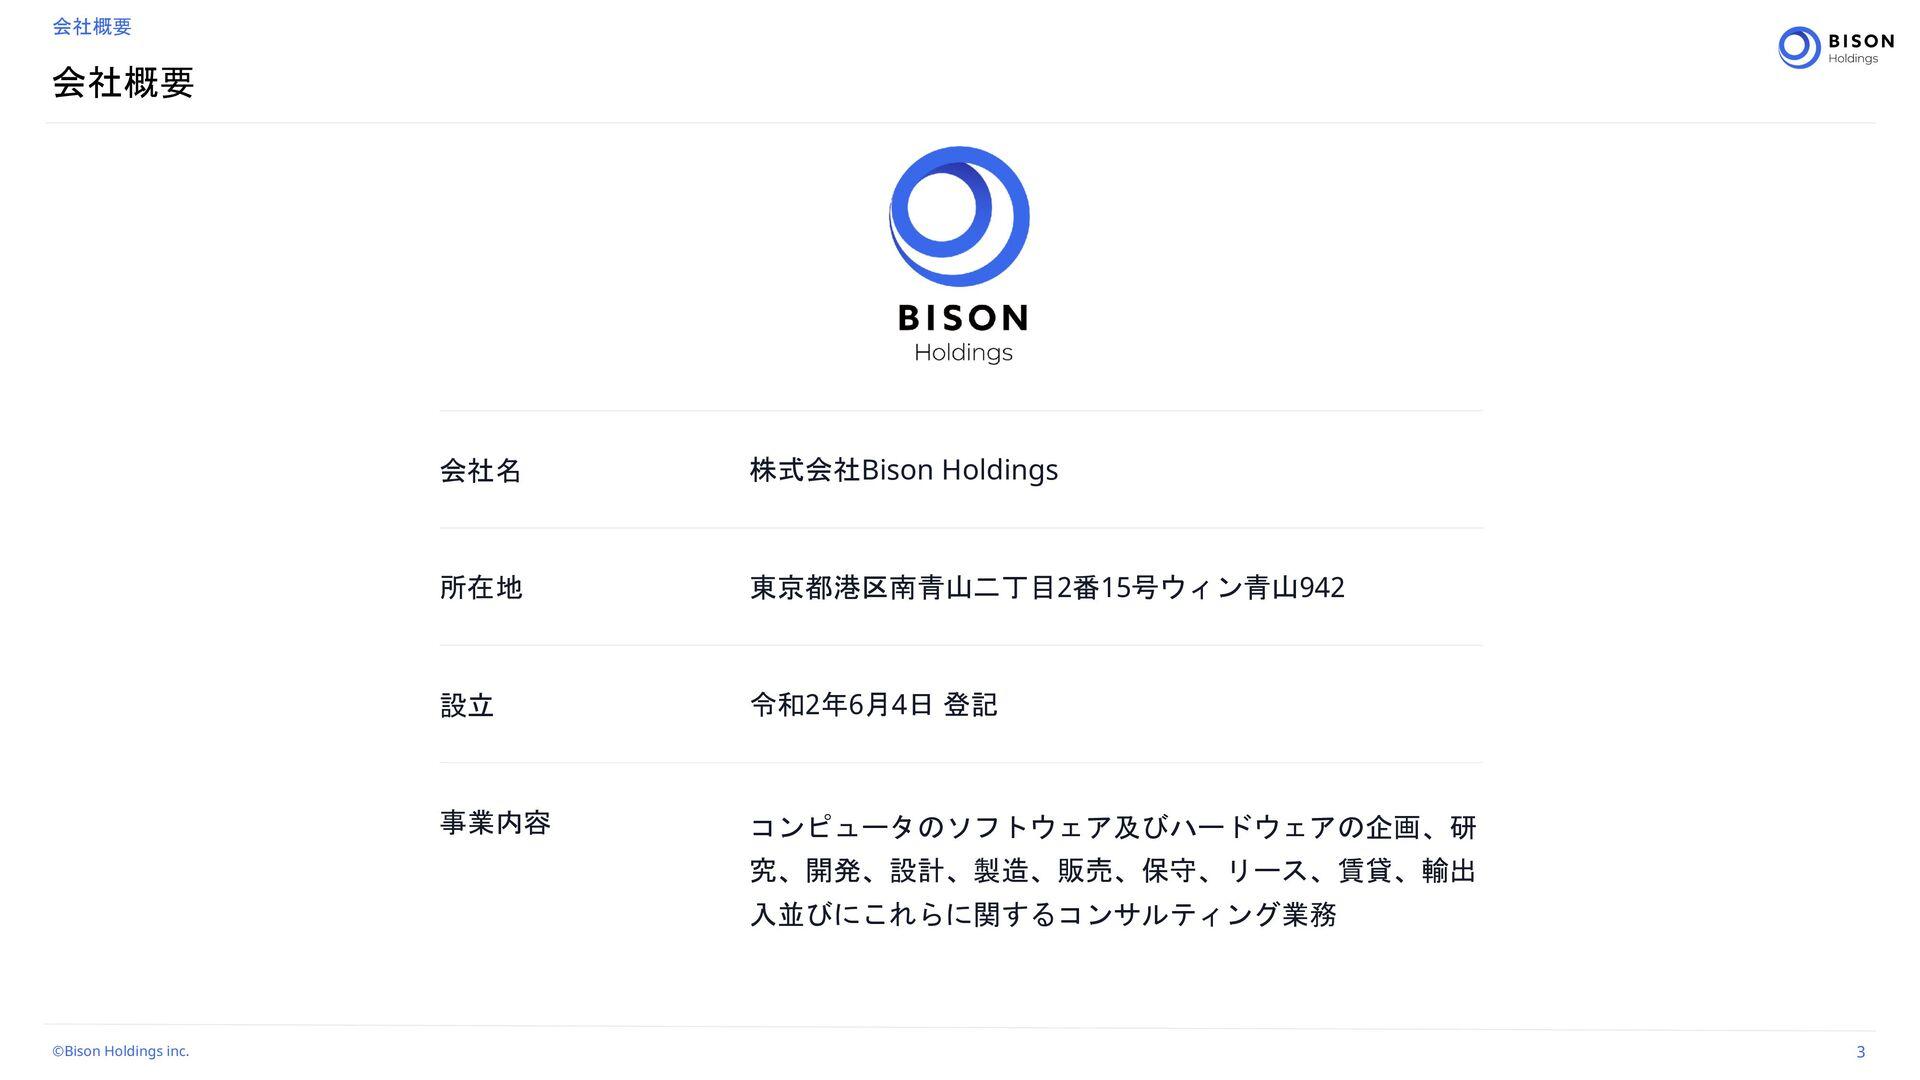 Bison Holdings Corporate Pro fi le 3 ձࣾ֓ཁ ձࣾใ ...